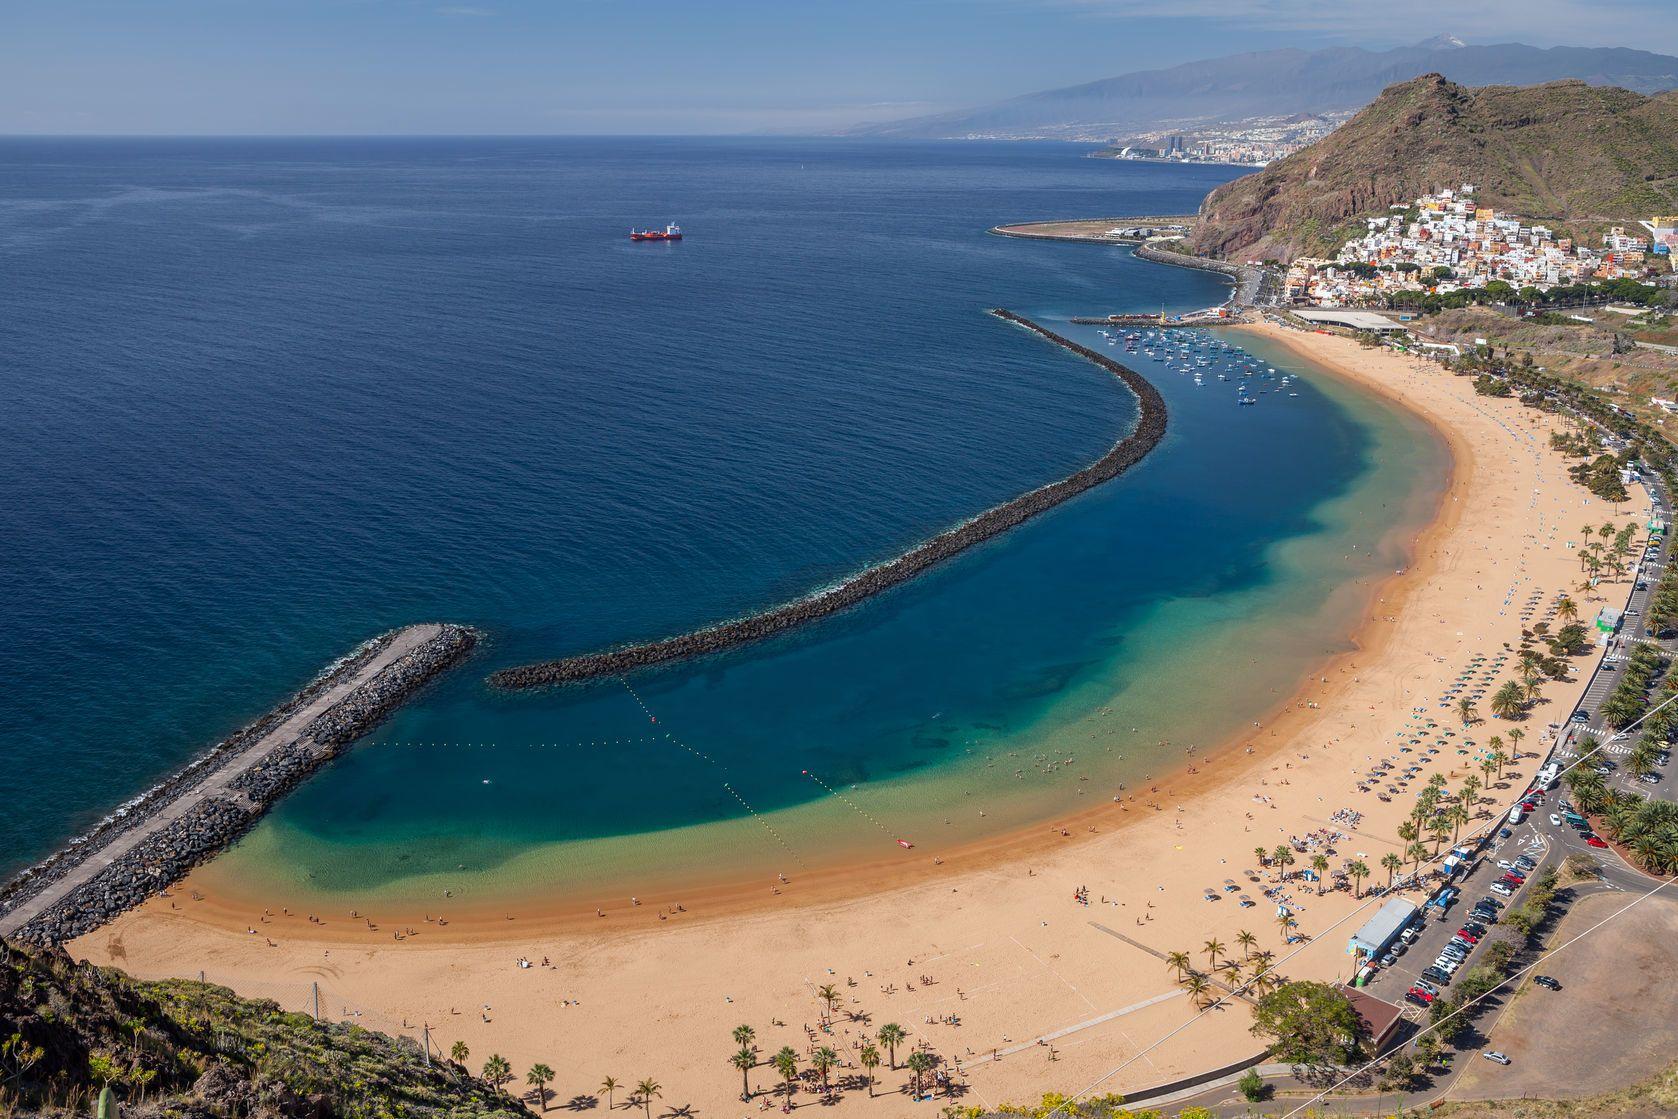 Pláž Teresitas na Tenerife | fotomem/123RF.com